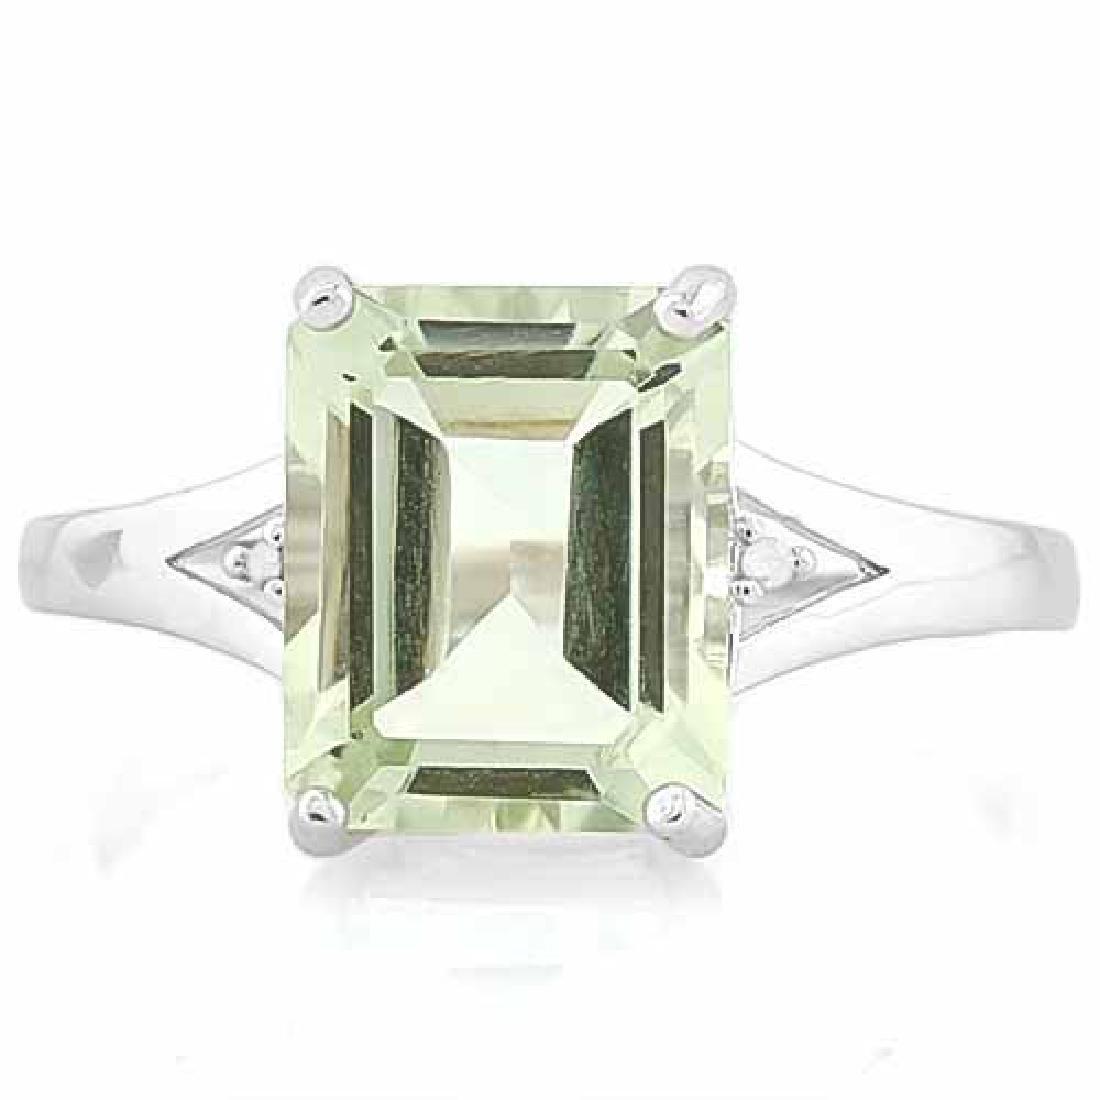 2 1/2 CARAT GREEN AMETHYST & DIAMOND 925 STERLING SILVE